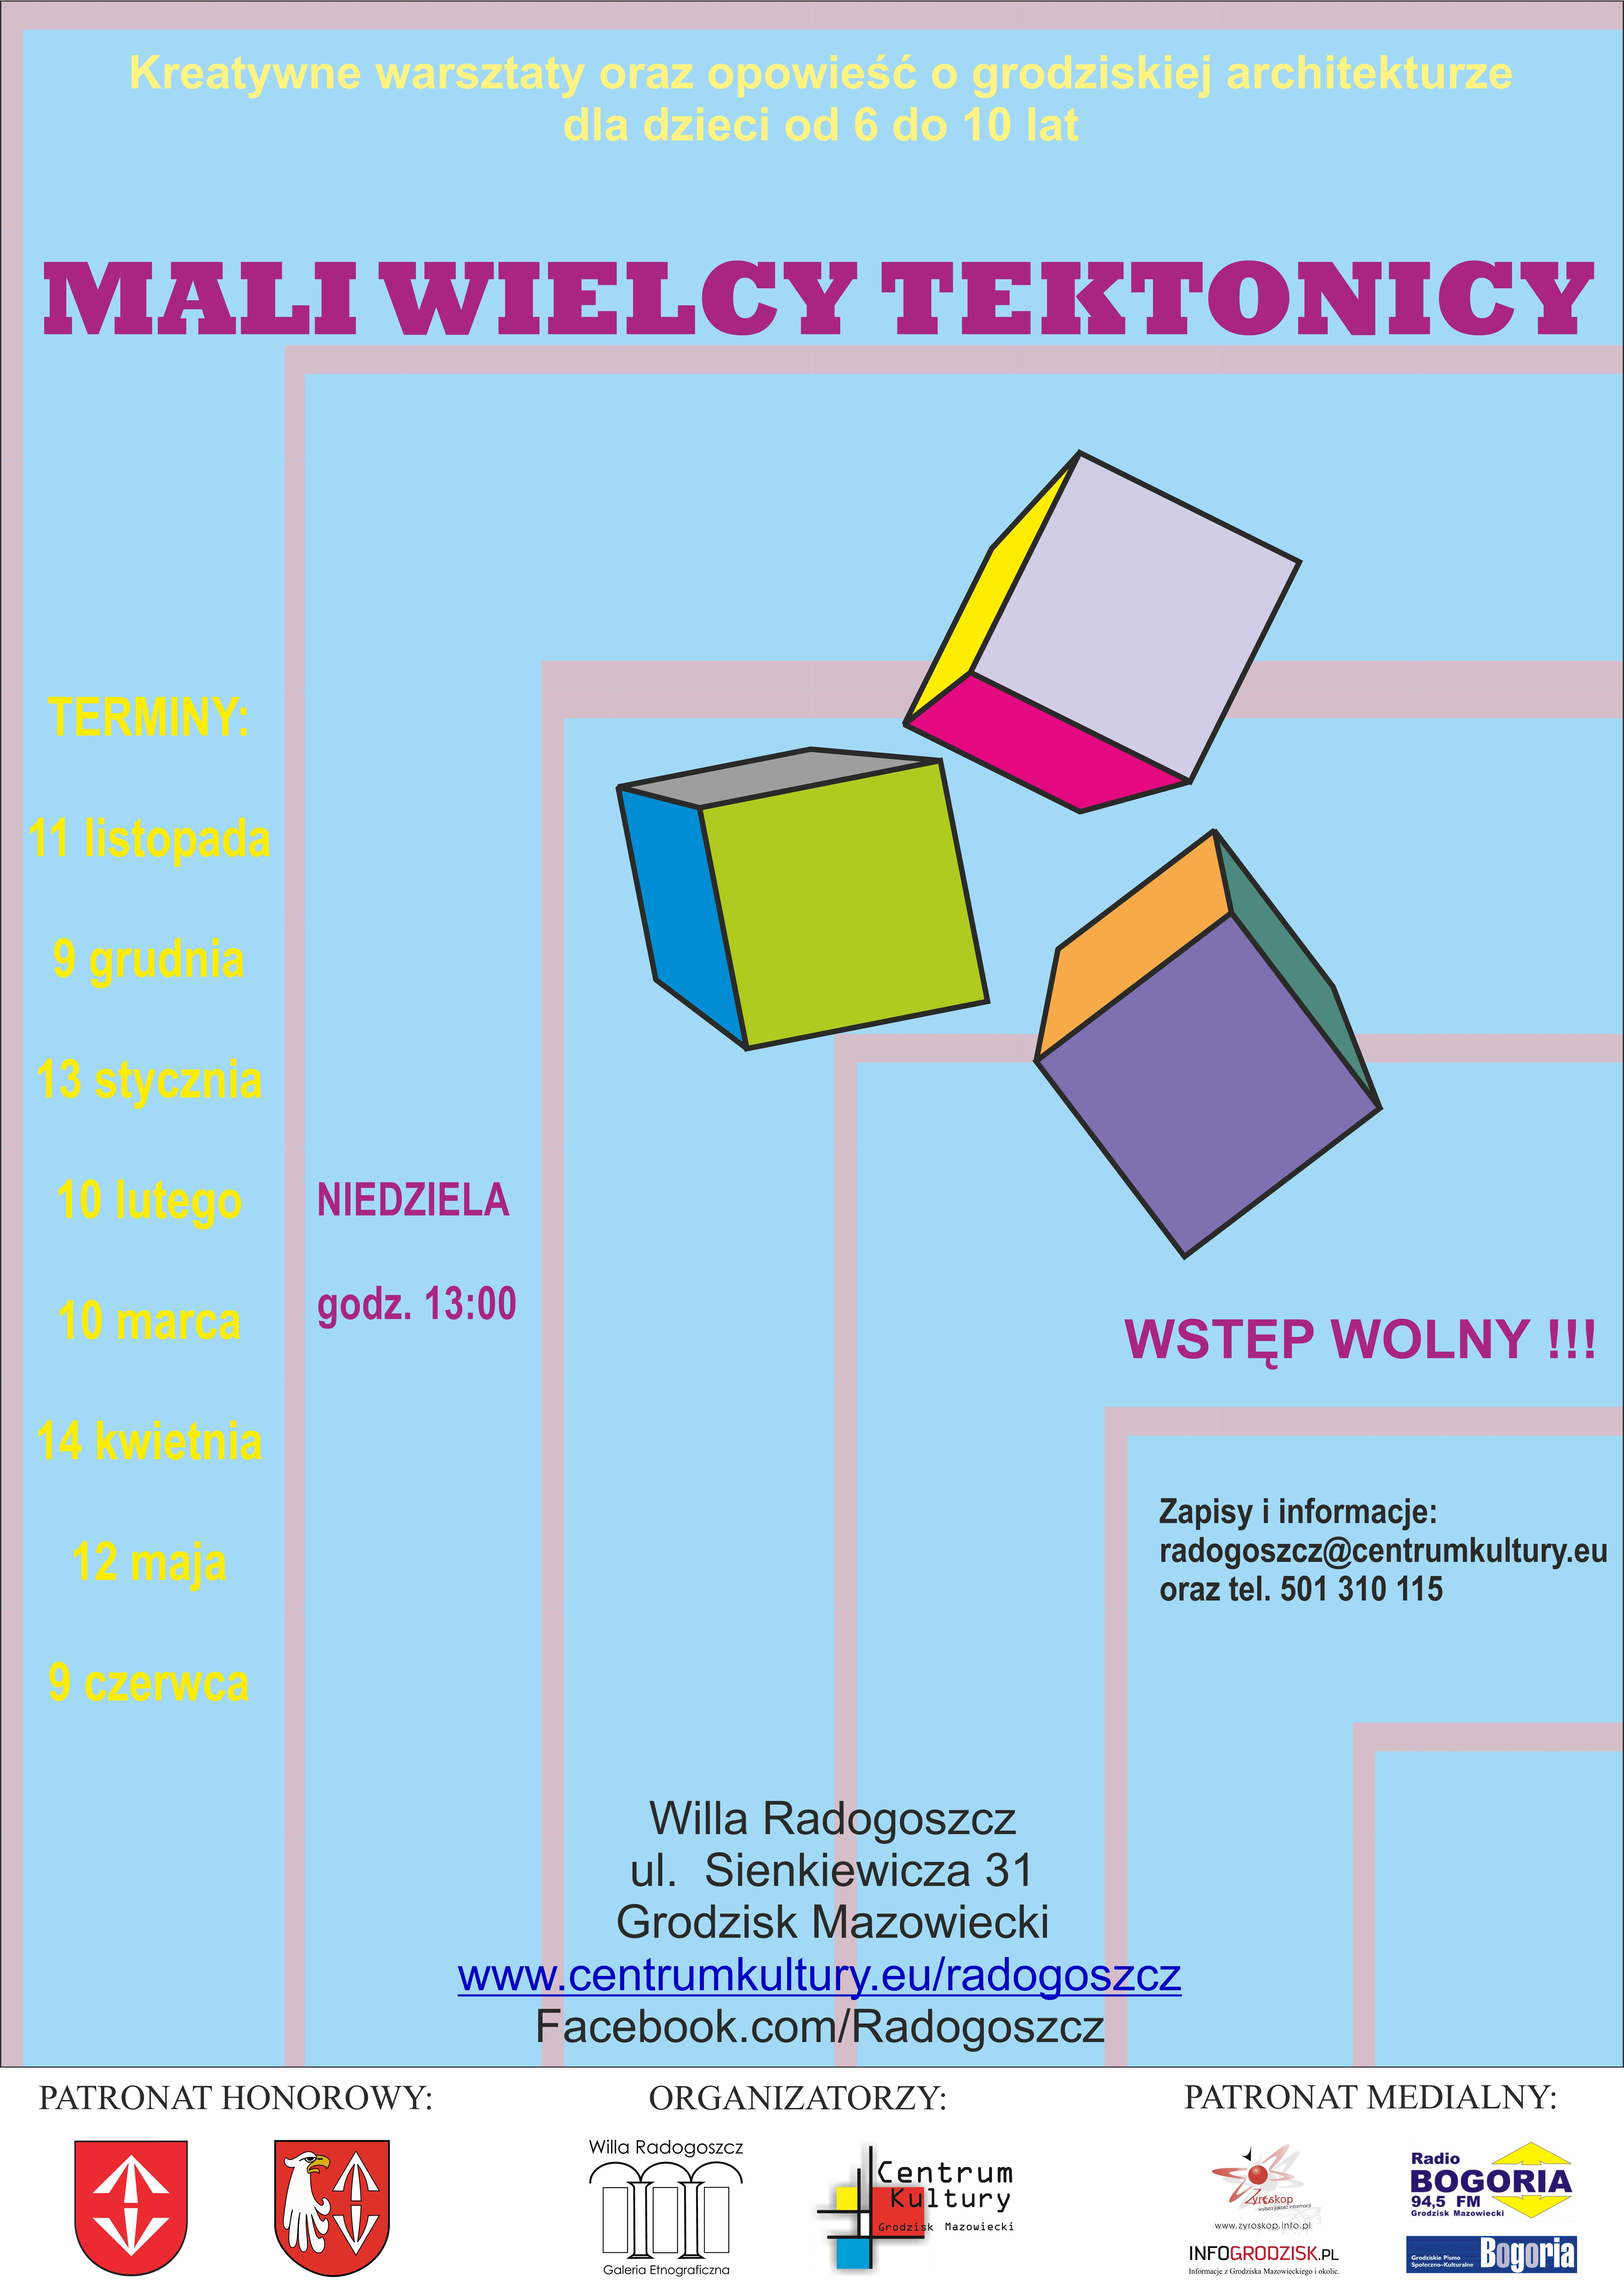 https://www.centrumkultury.eu/pliki/ckg/grafika/Radogoszcz/Galeria/Tektonicy plakat.jpg